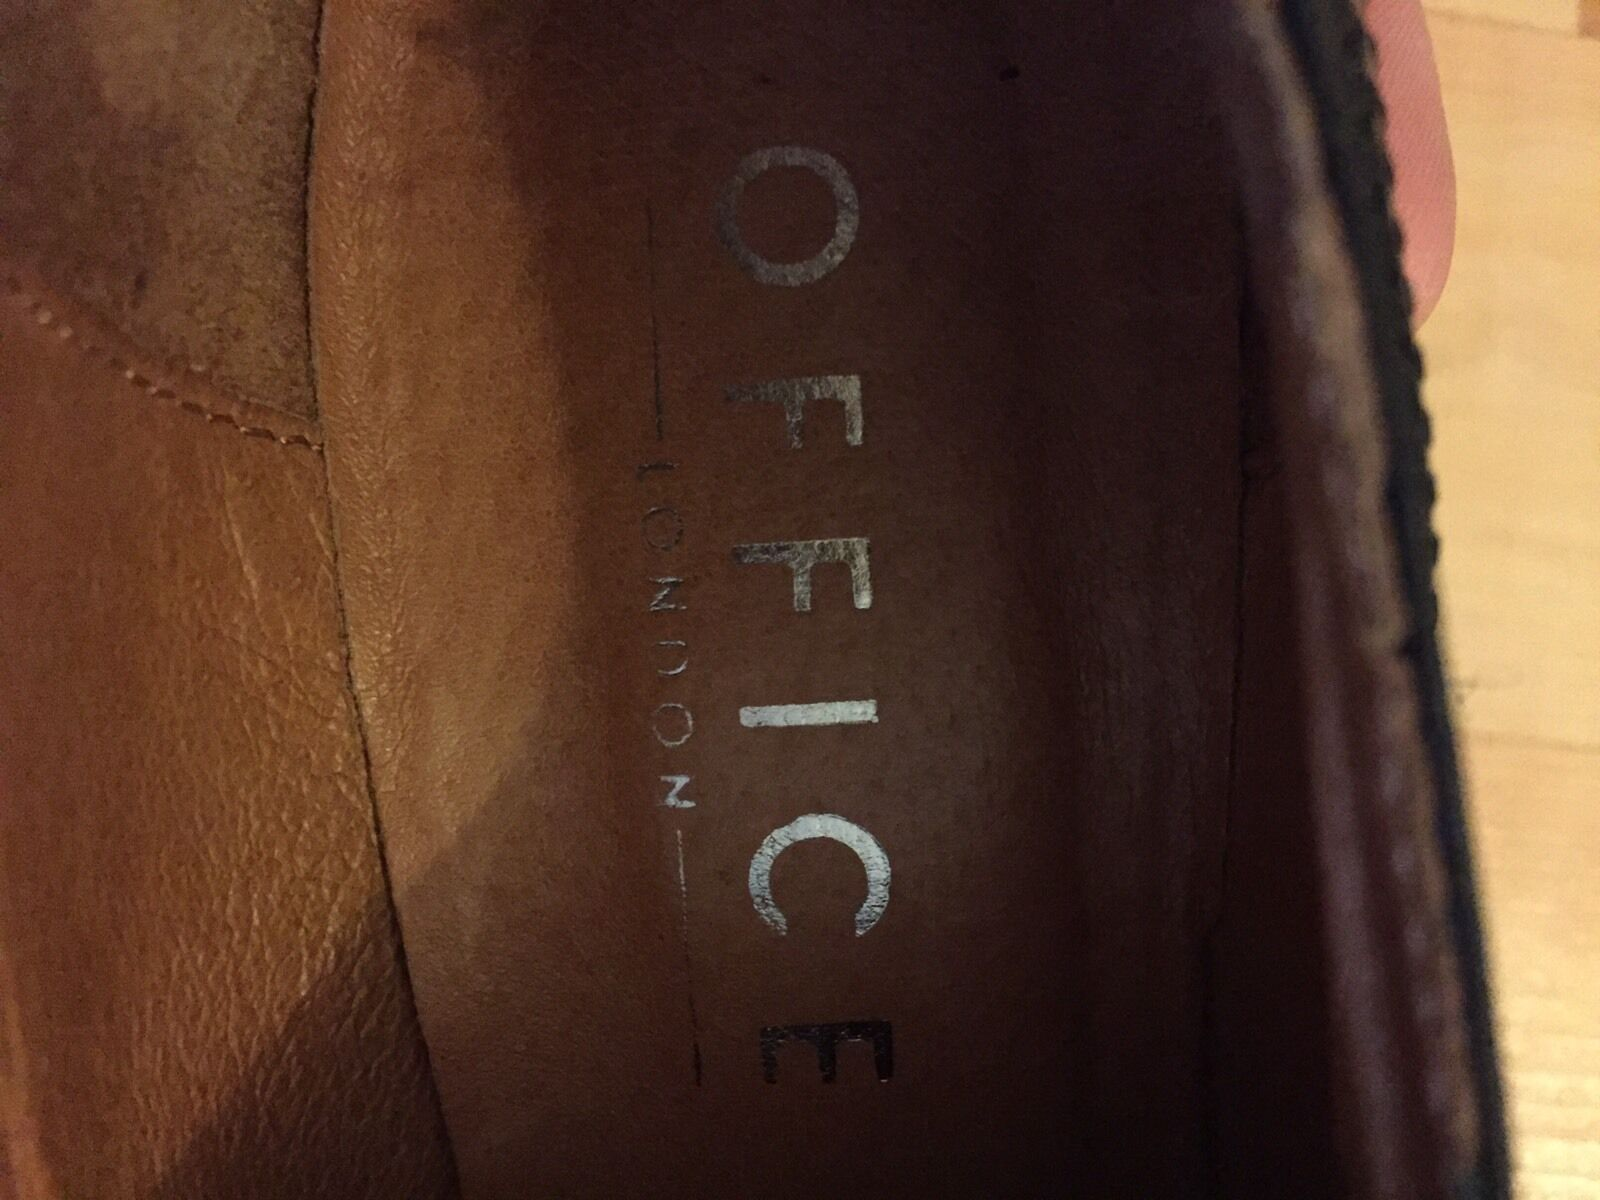 Office London Pumps Hohe Echtes Leder 38/ 38,5 Hohe Pumps Schuhe Damen Schwarz -Schnürpumps 9ef993